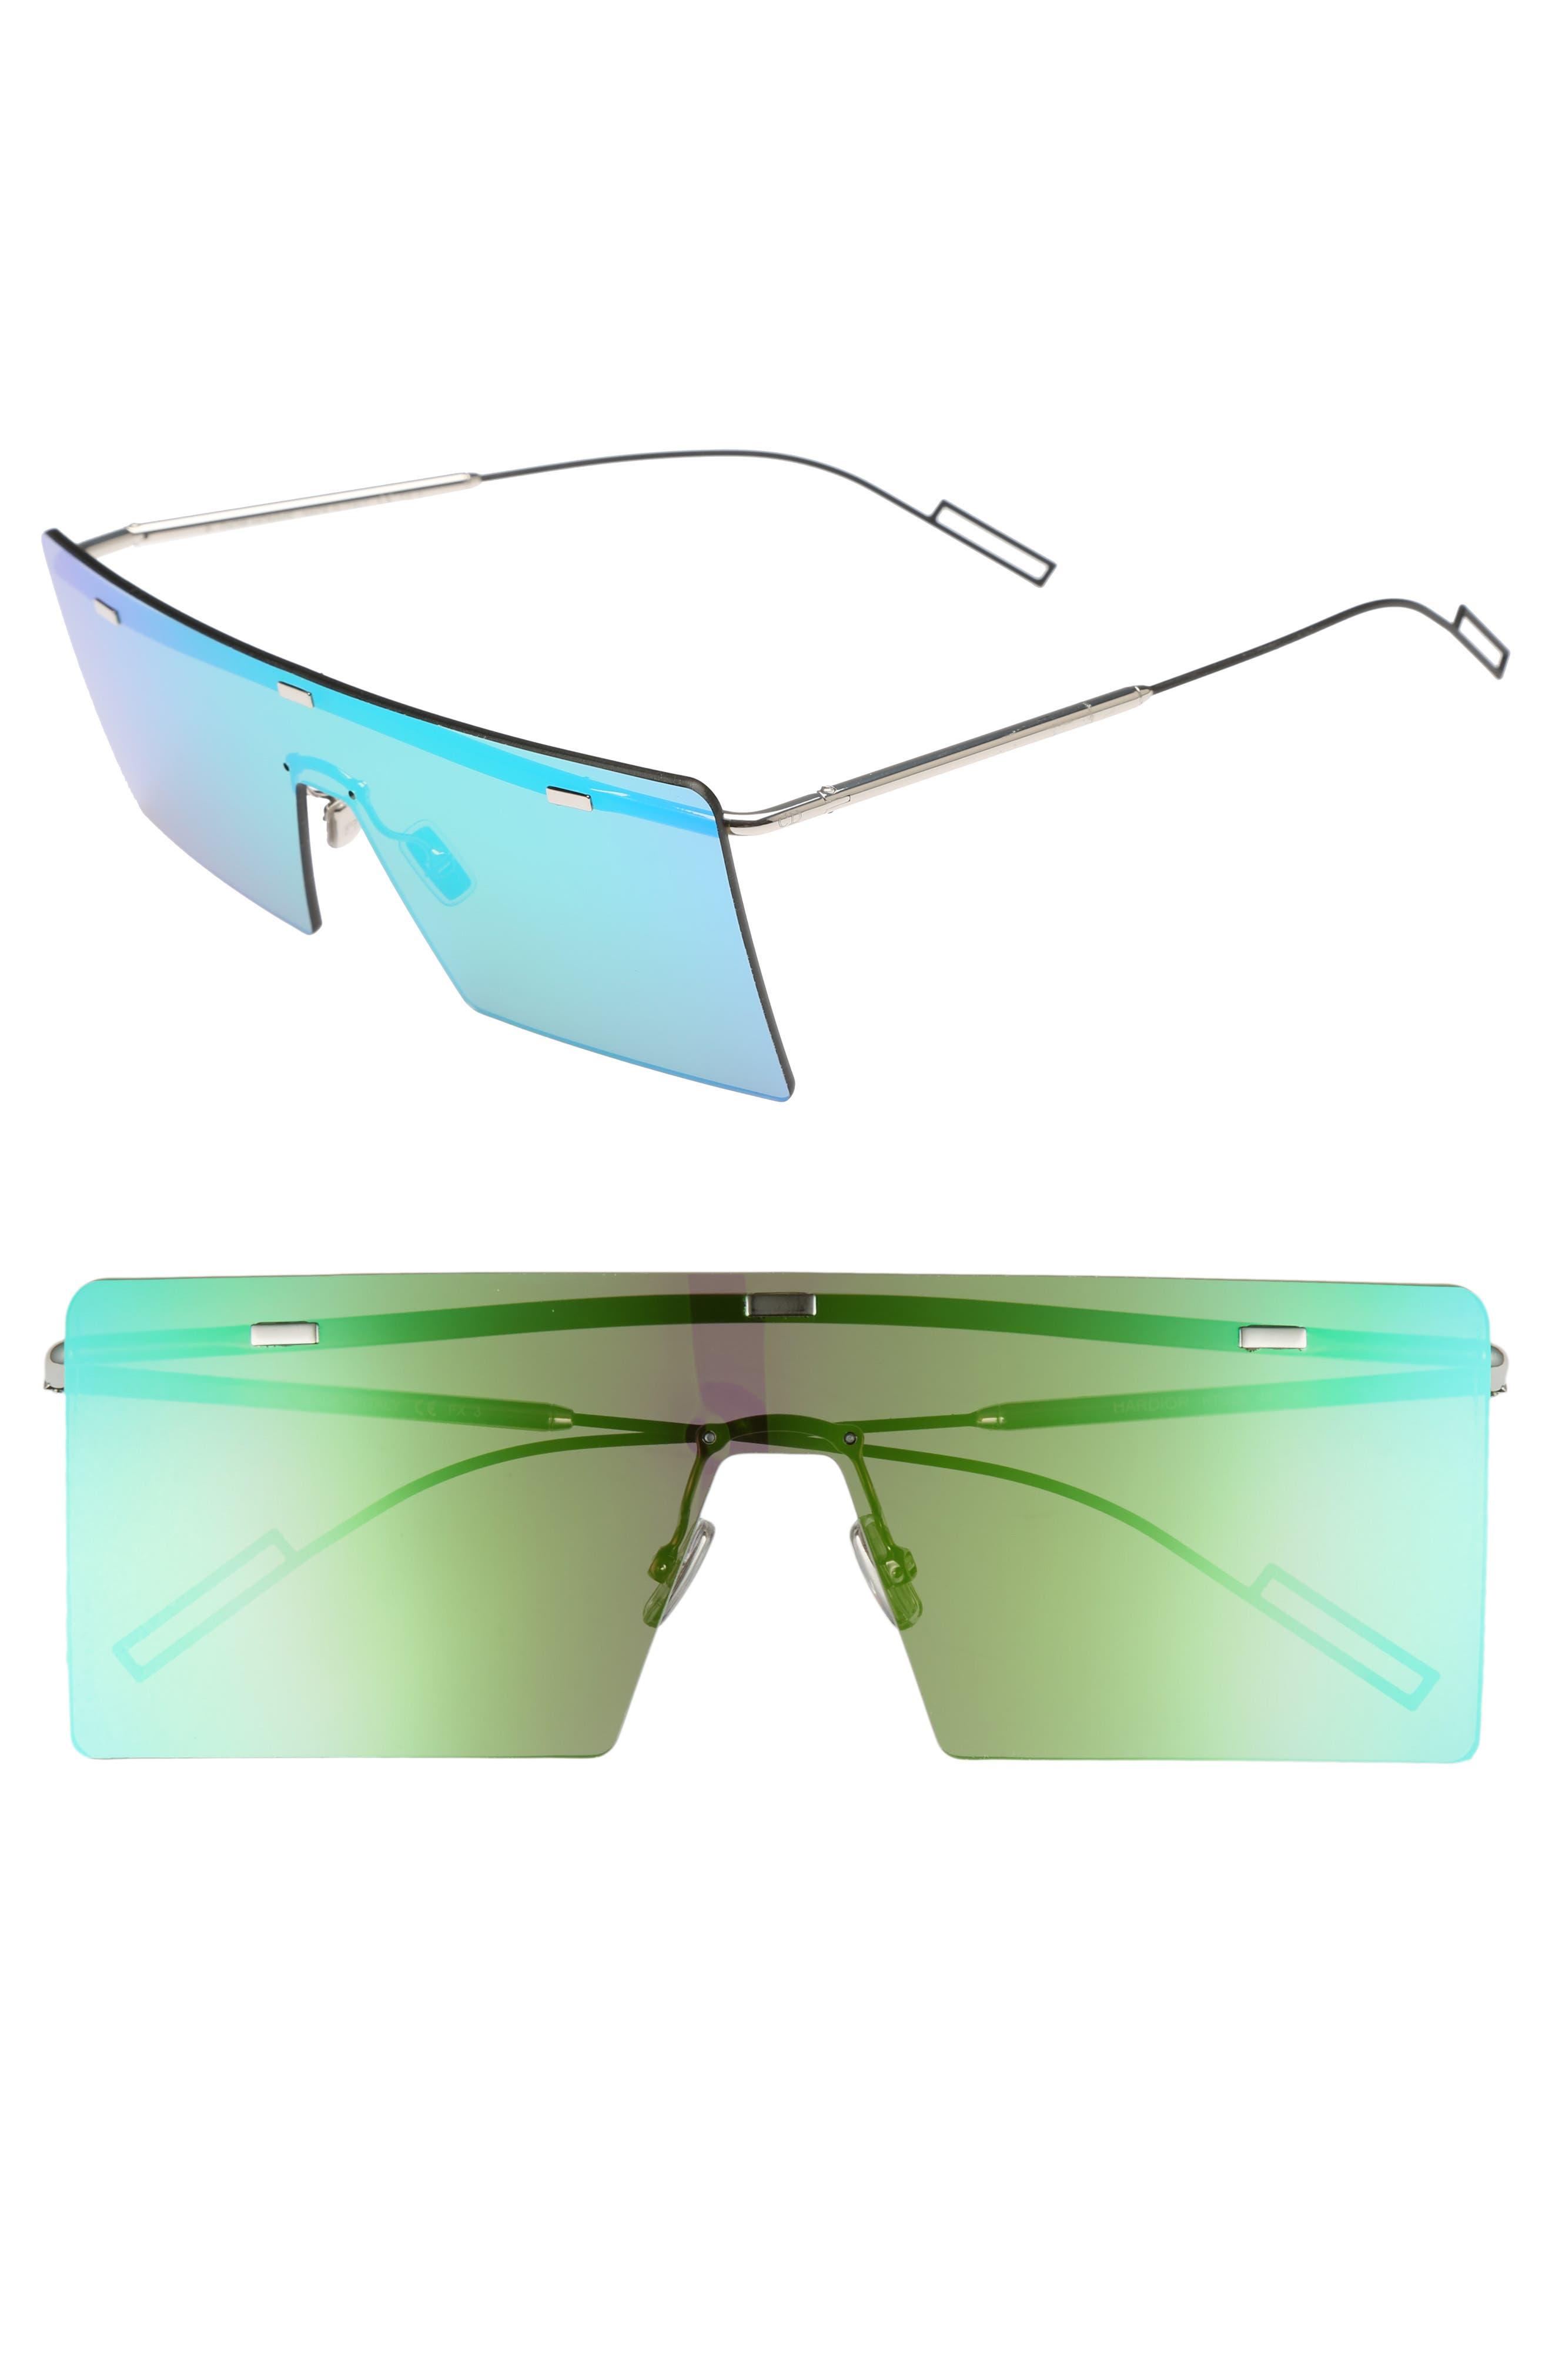 Hardior 65mm Sunglasses,                         Main,                         color, Palladium/ Green